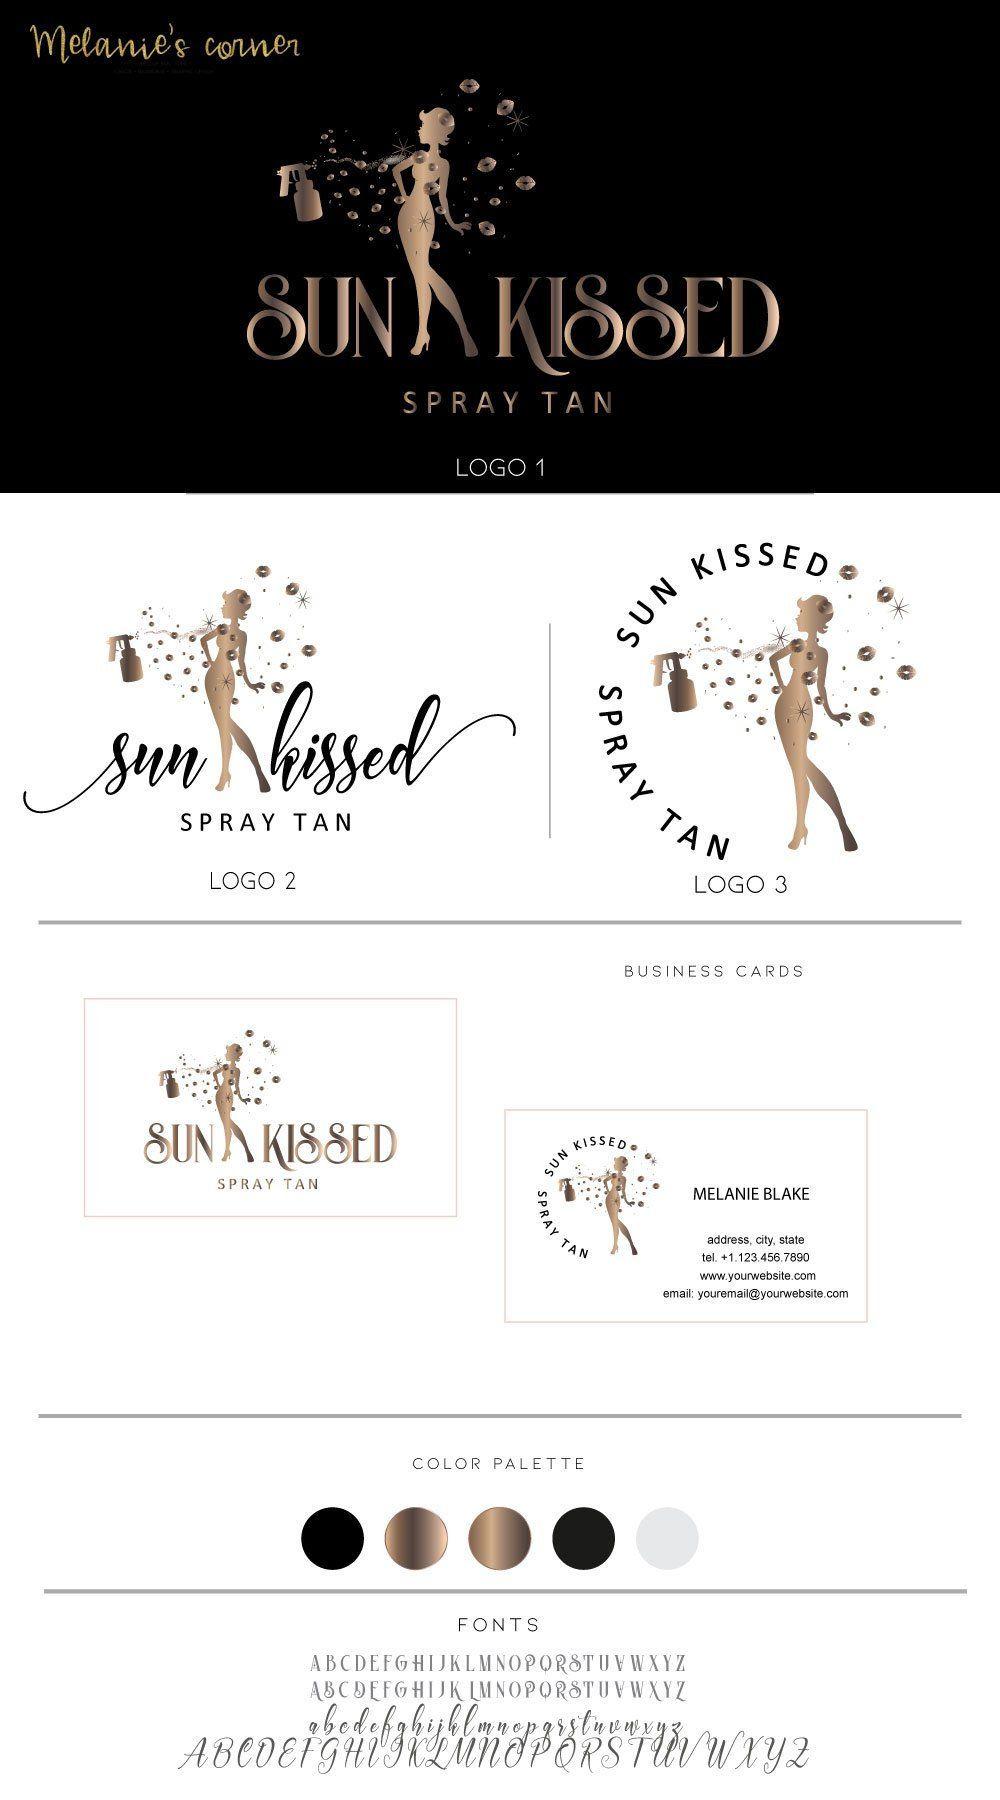 Spray Tan Logo Mobile Tanning Logo 350 Etsy Spray Tan Business Mobile Tanning Spray Tanning